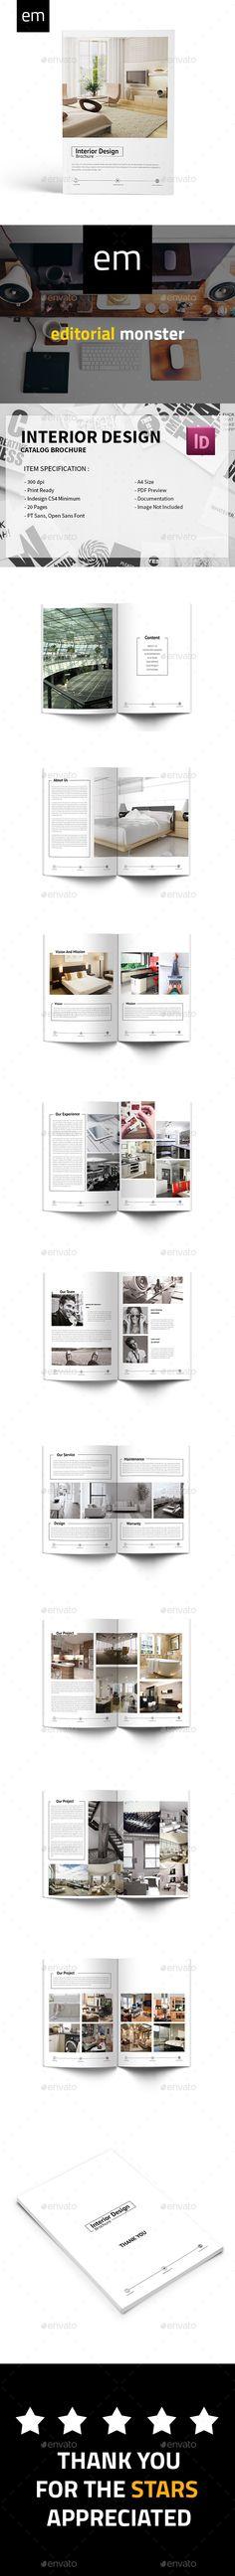 Modern Indesign Catalogue 02 UX\/UI Designer, Texts and Modern - interior design brochure template